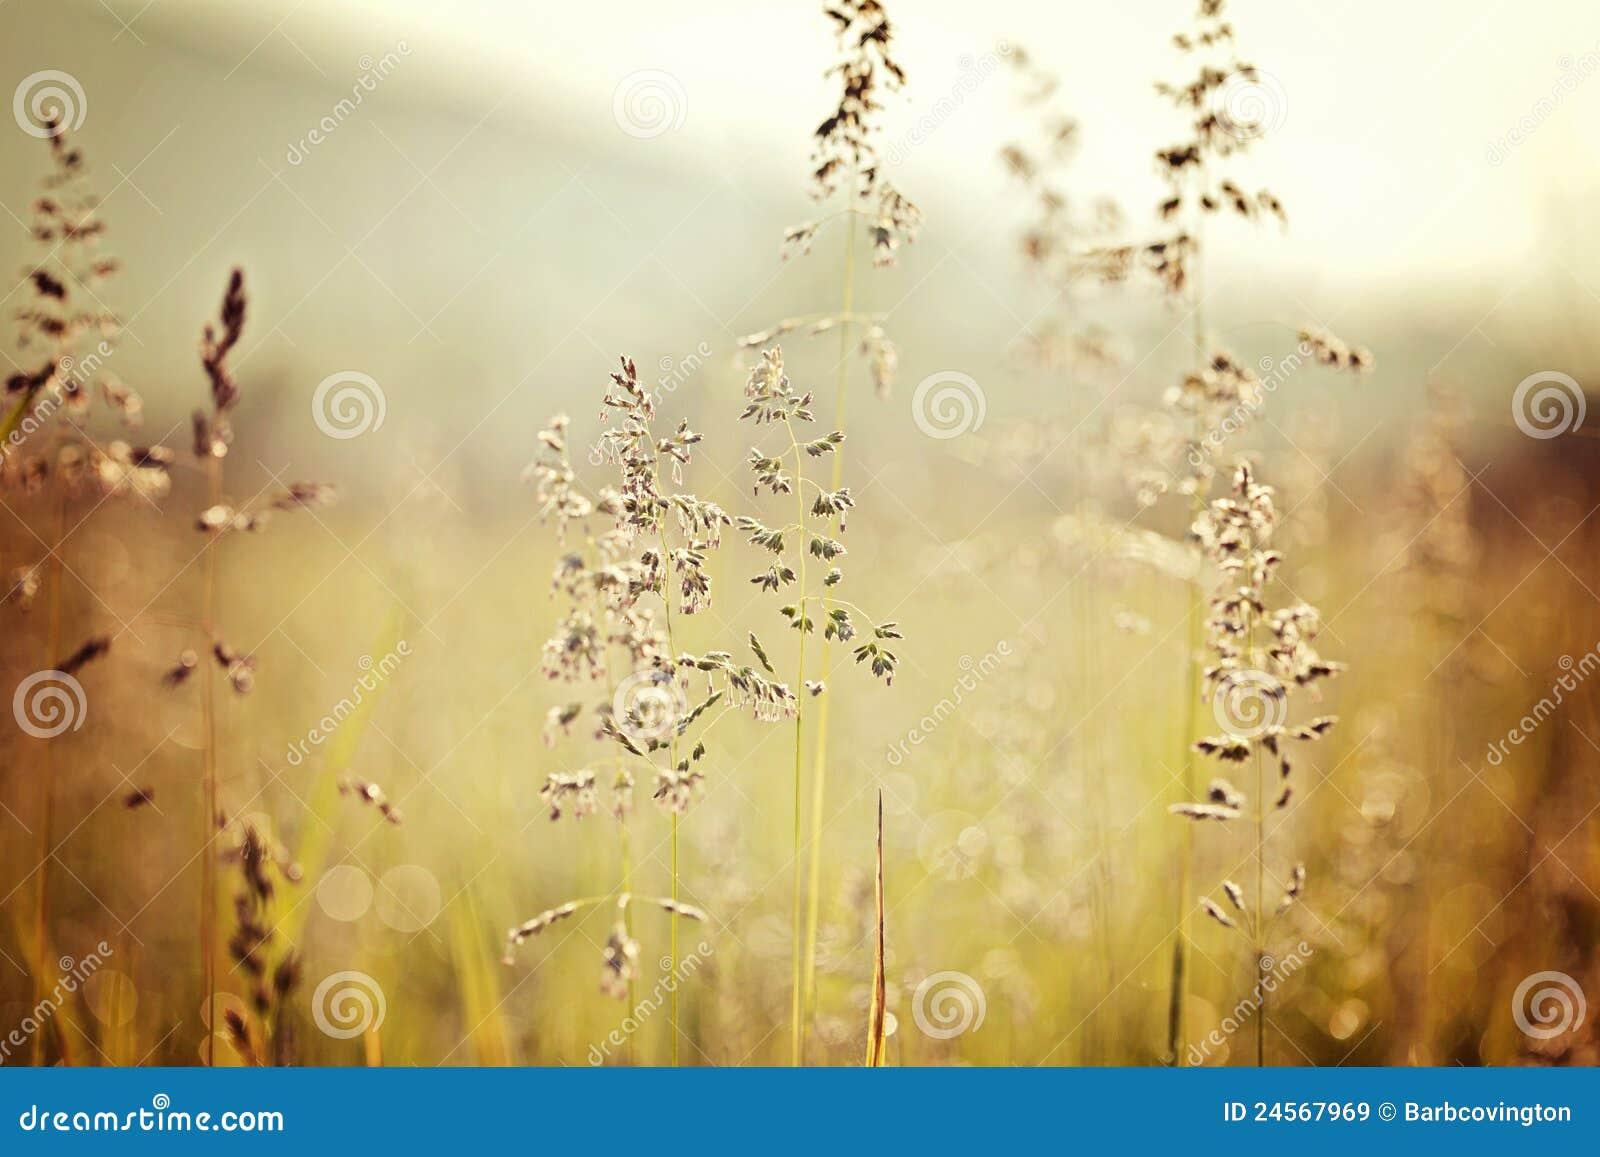 Smoky Mountains Cades Cove grass fields